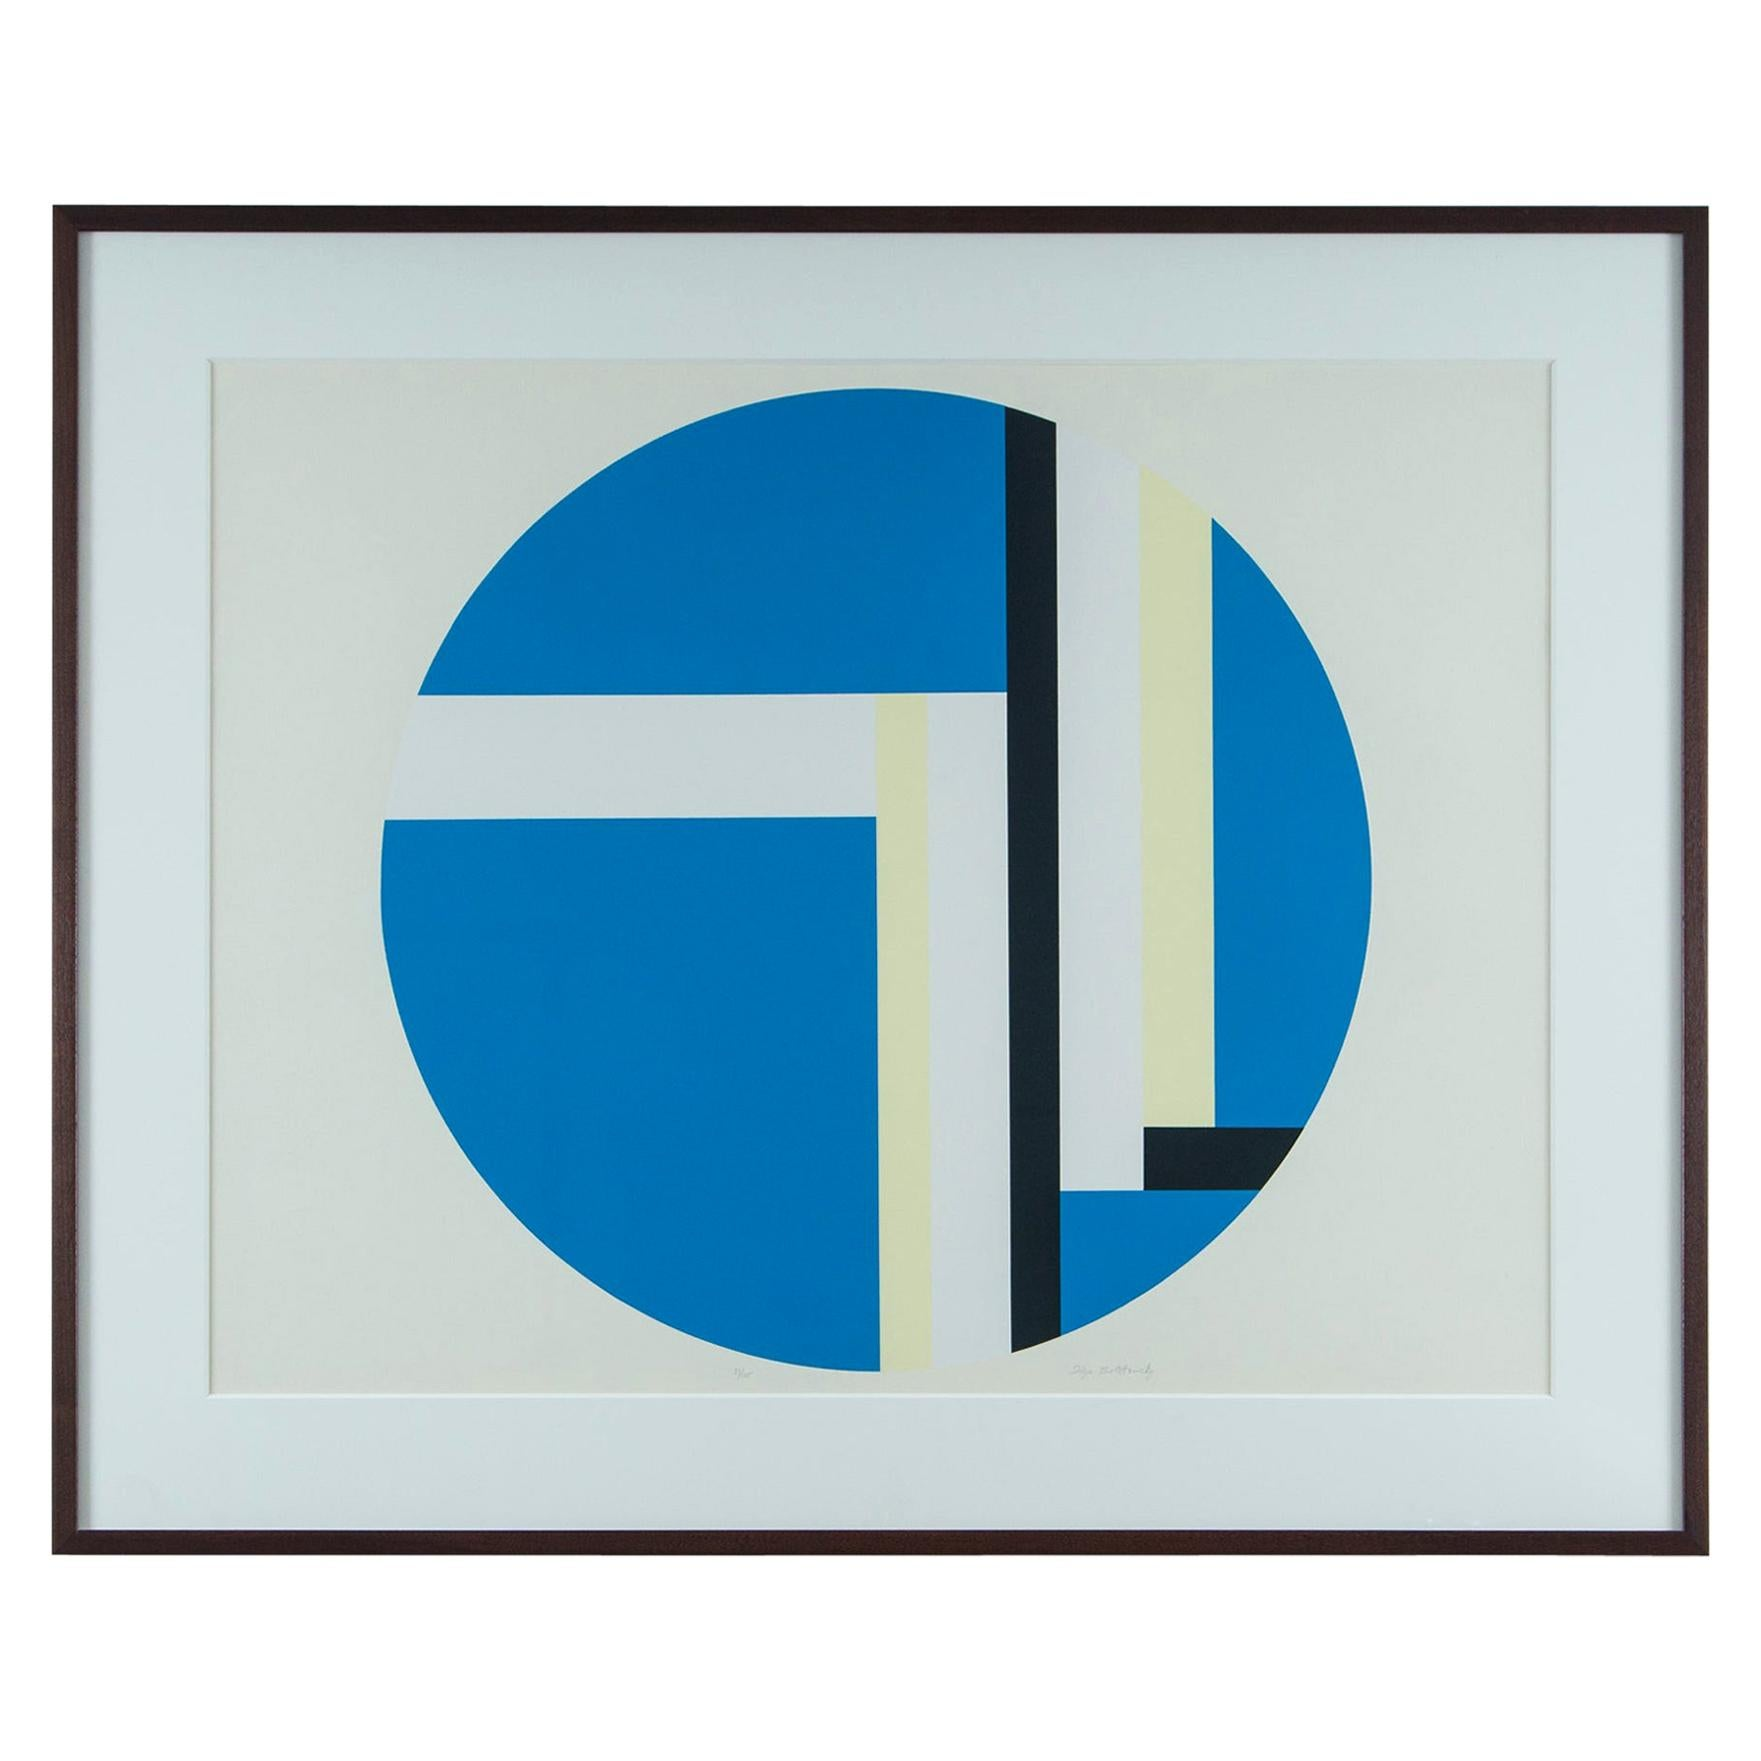 Ilya Bolotowsky Geometric Signed, Editioned Silkscreen Print, Series 2